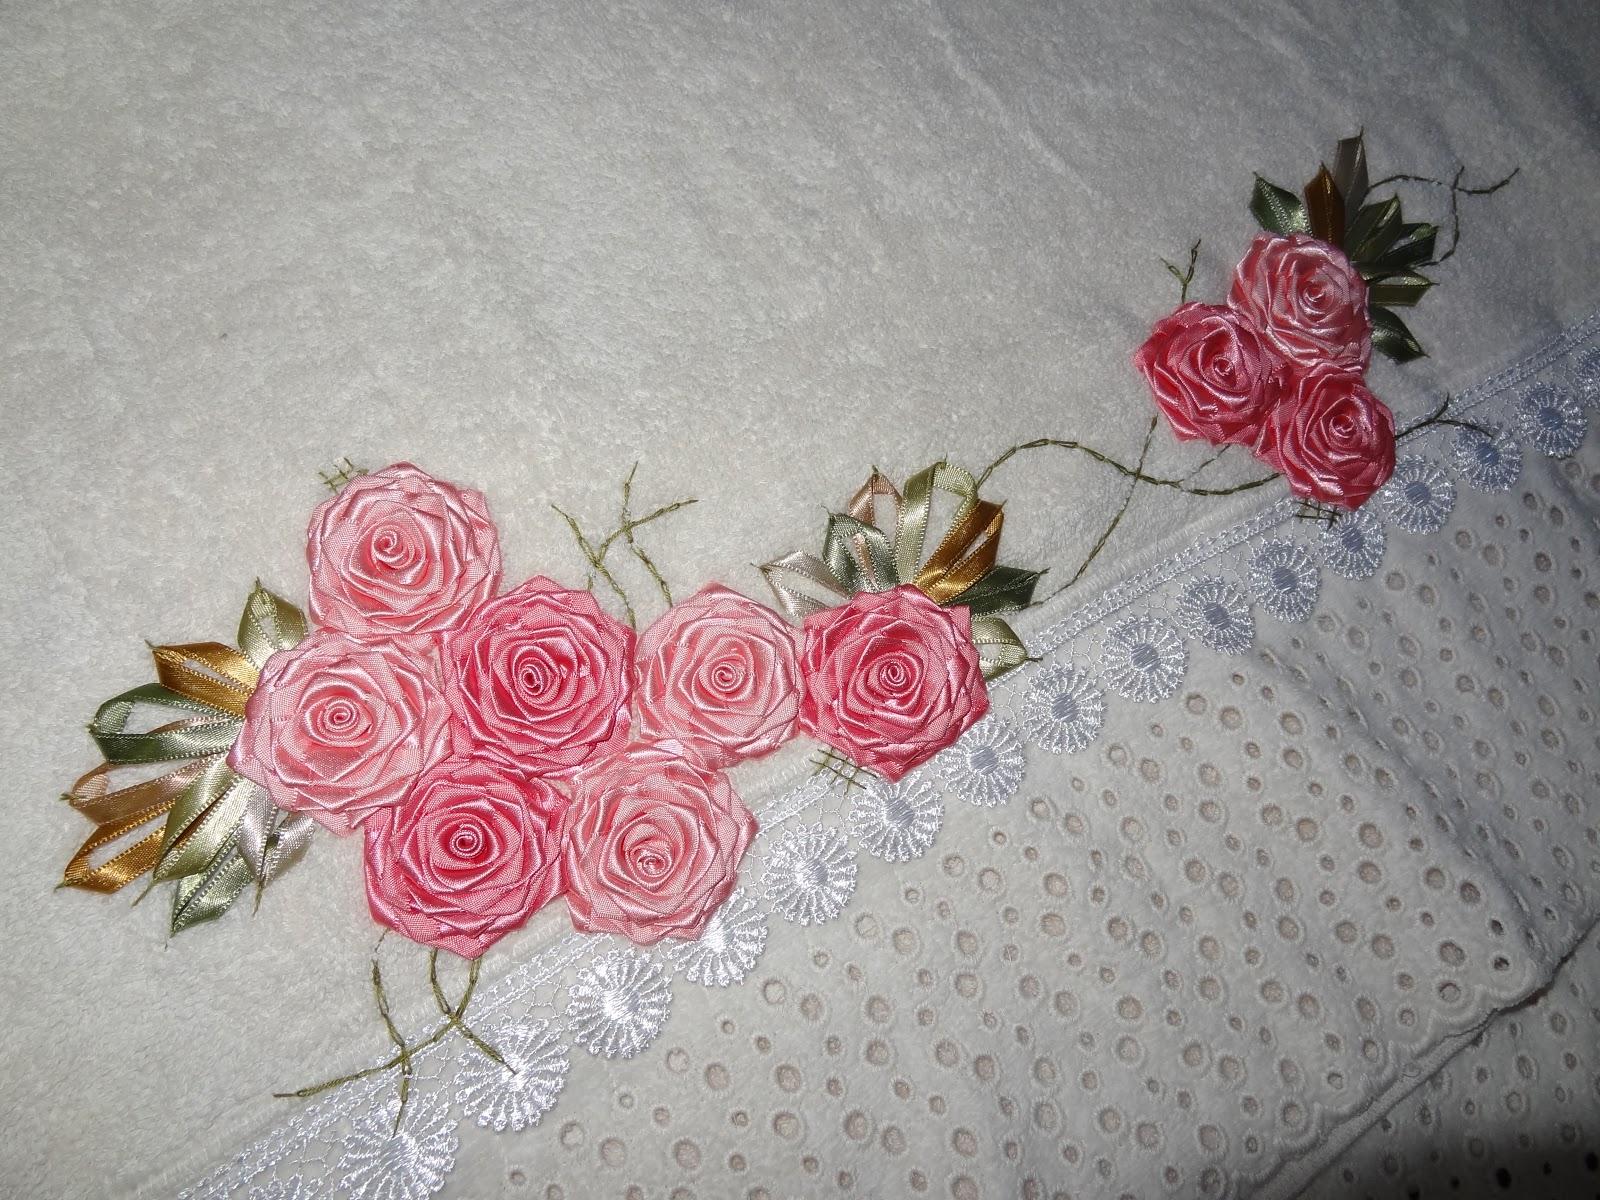 Armarinho Fernando Tatuape ~ LOY HANDCRAFTS, TOWELS EMBROYDERED WITH SATIN RIBBON ROSES Conjunto de toalhas